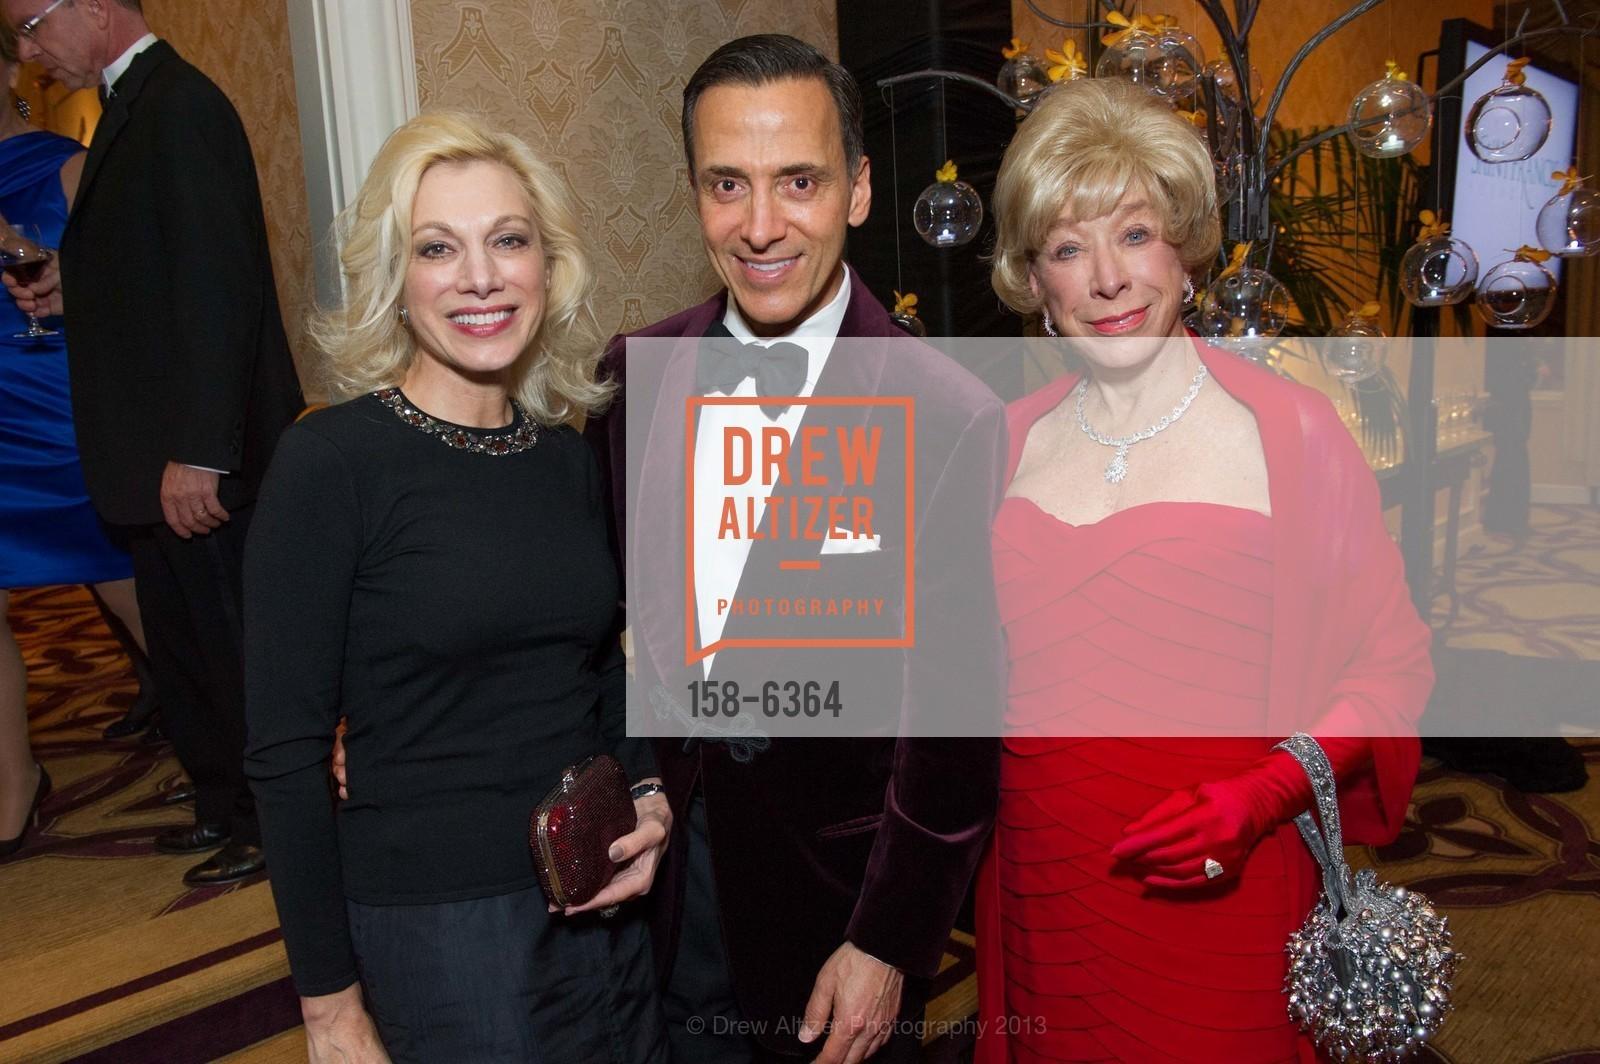 Cynthia Schreuder, Alan Malouf, Maria Pitcairn, 25th Anniversary Holiday HOB NOB ON THE HILL, US, December 6th, 2013